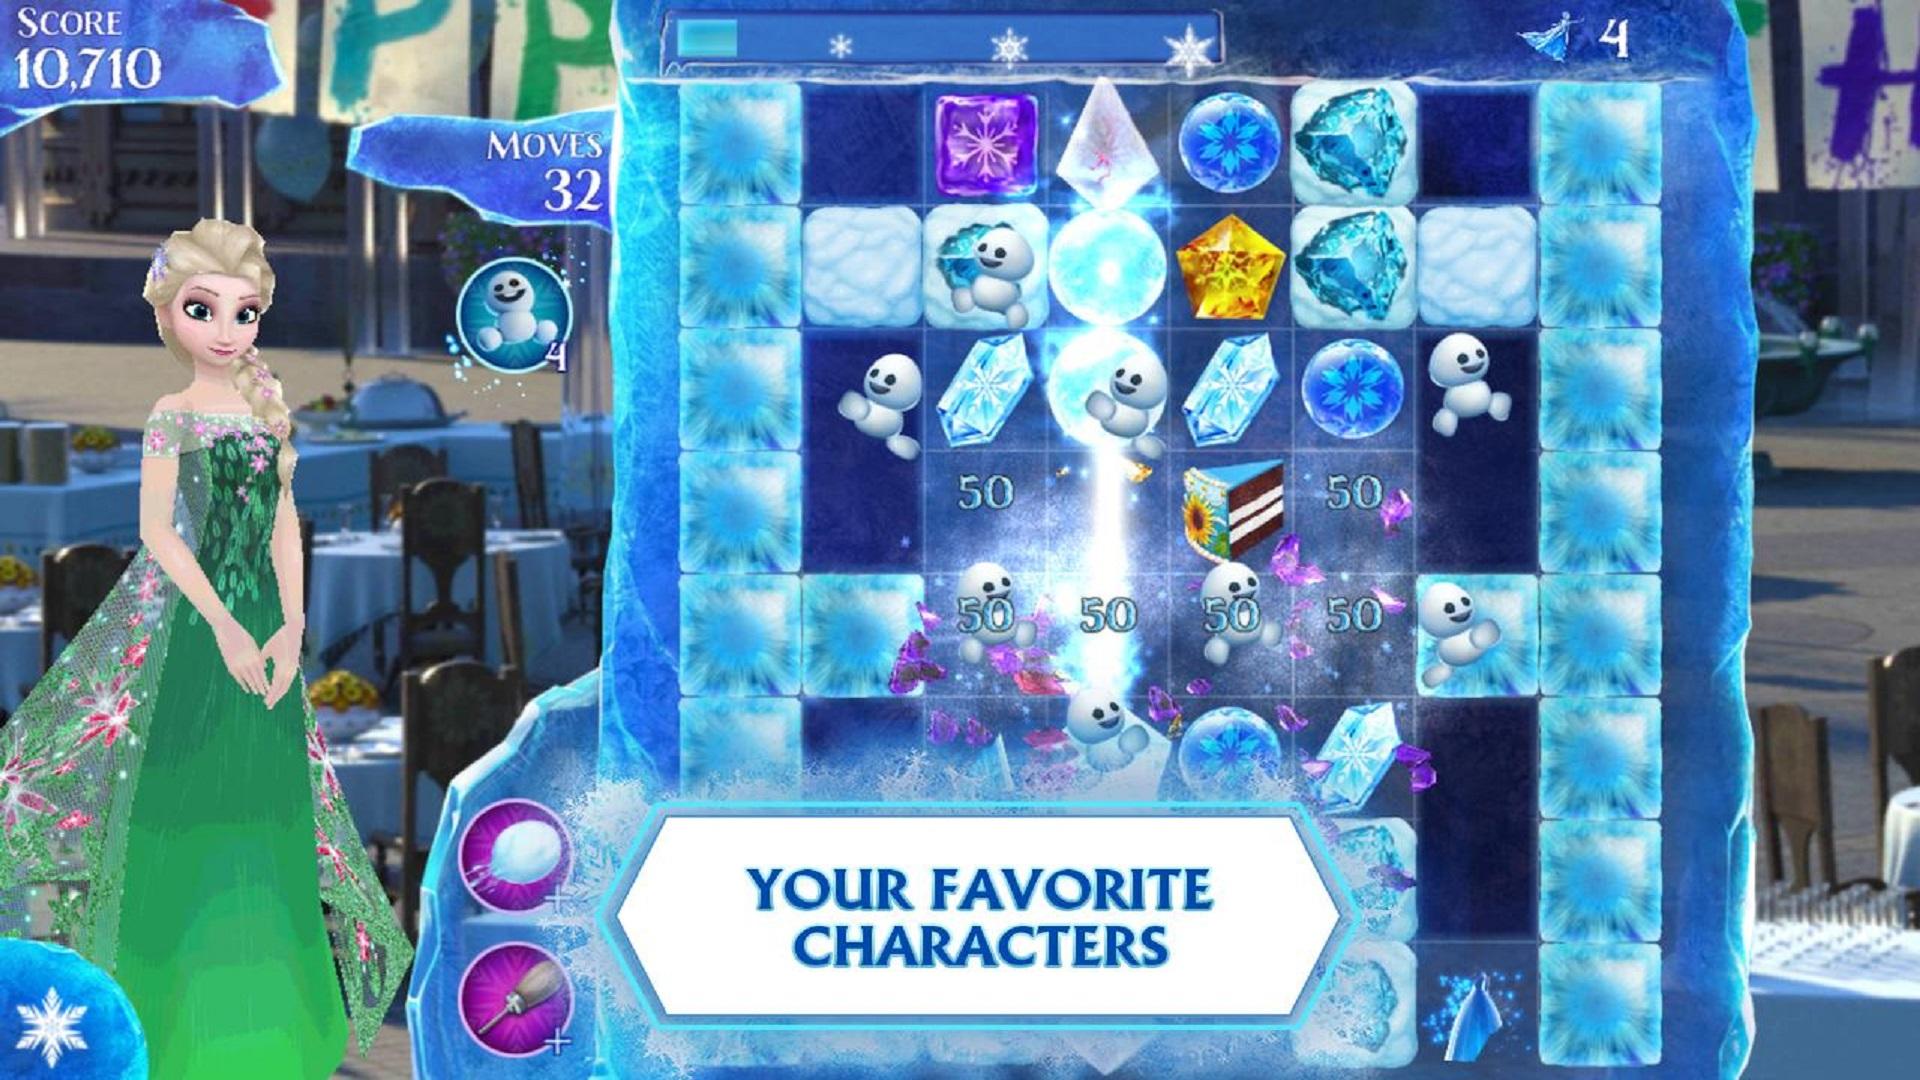 best-hit-games-frozen-free-fall-hd wallpapers free